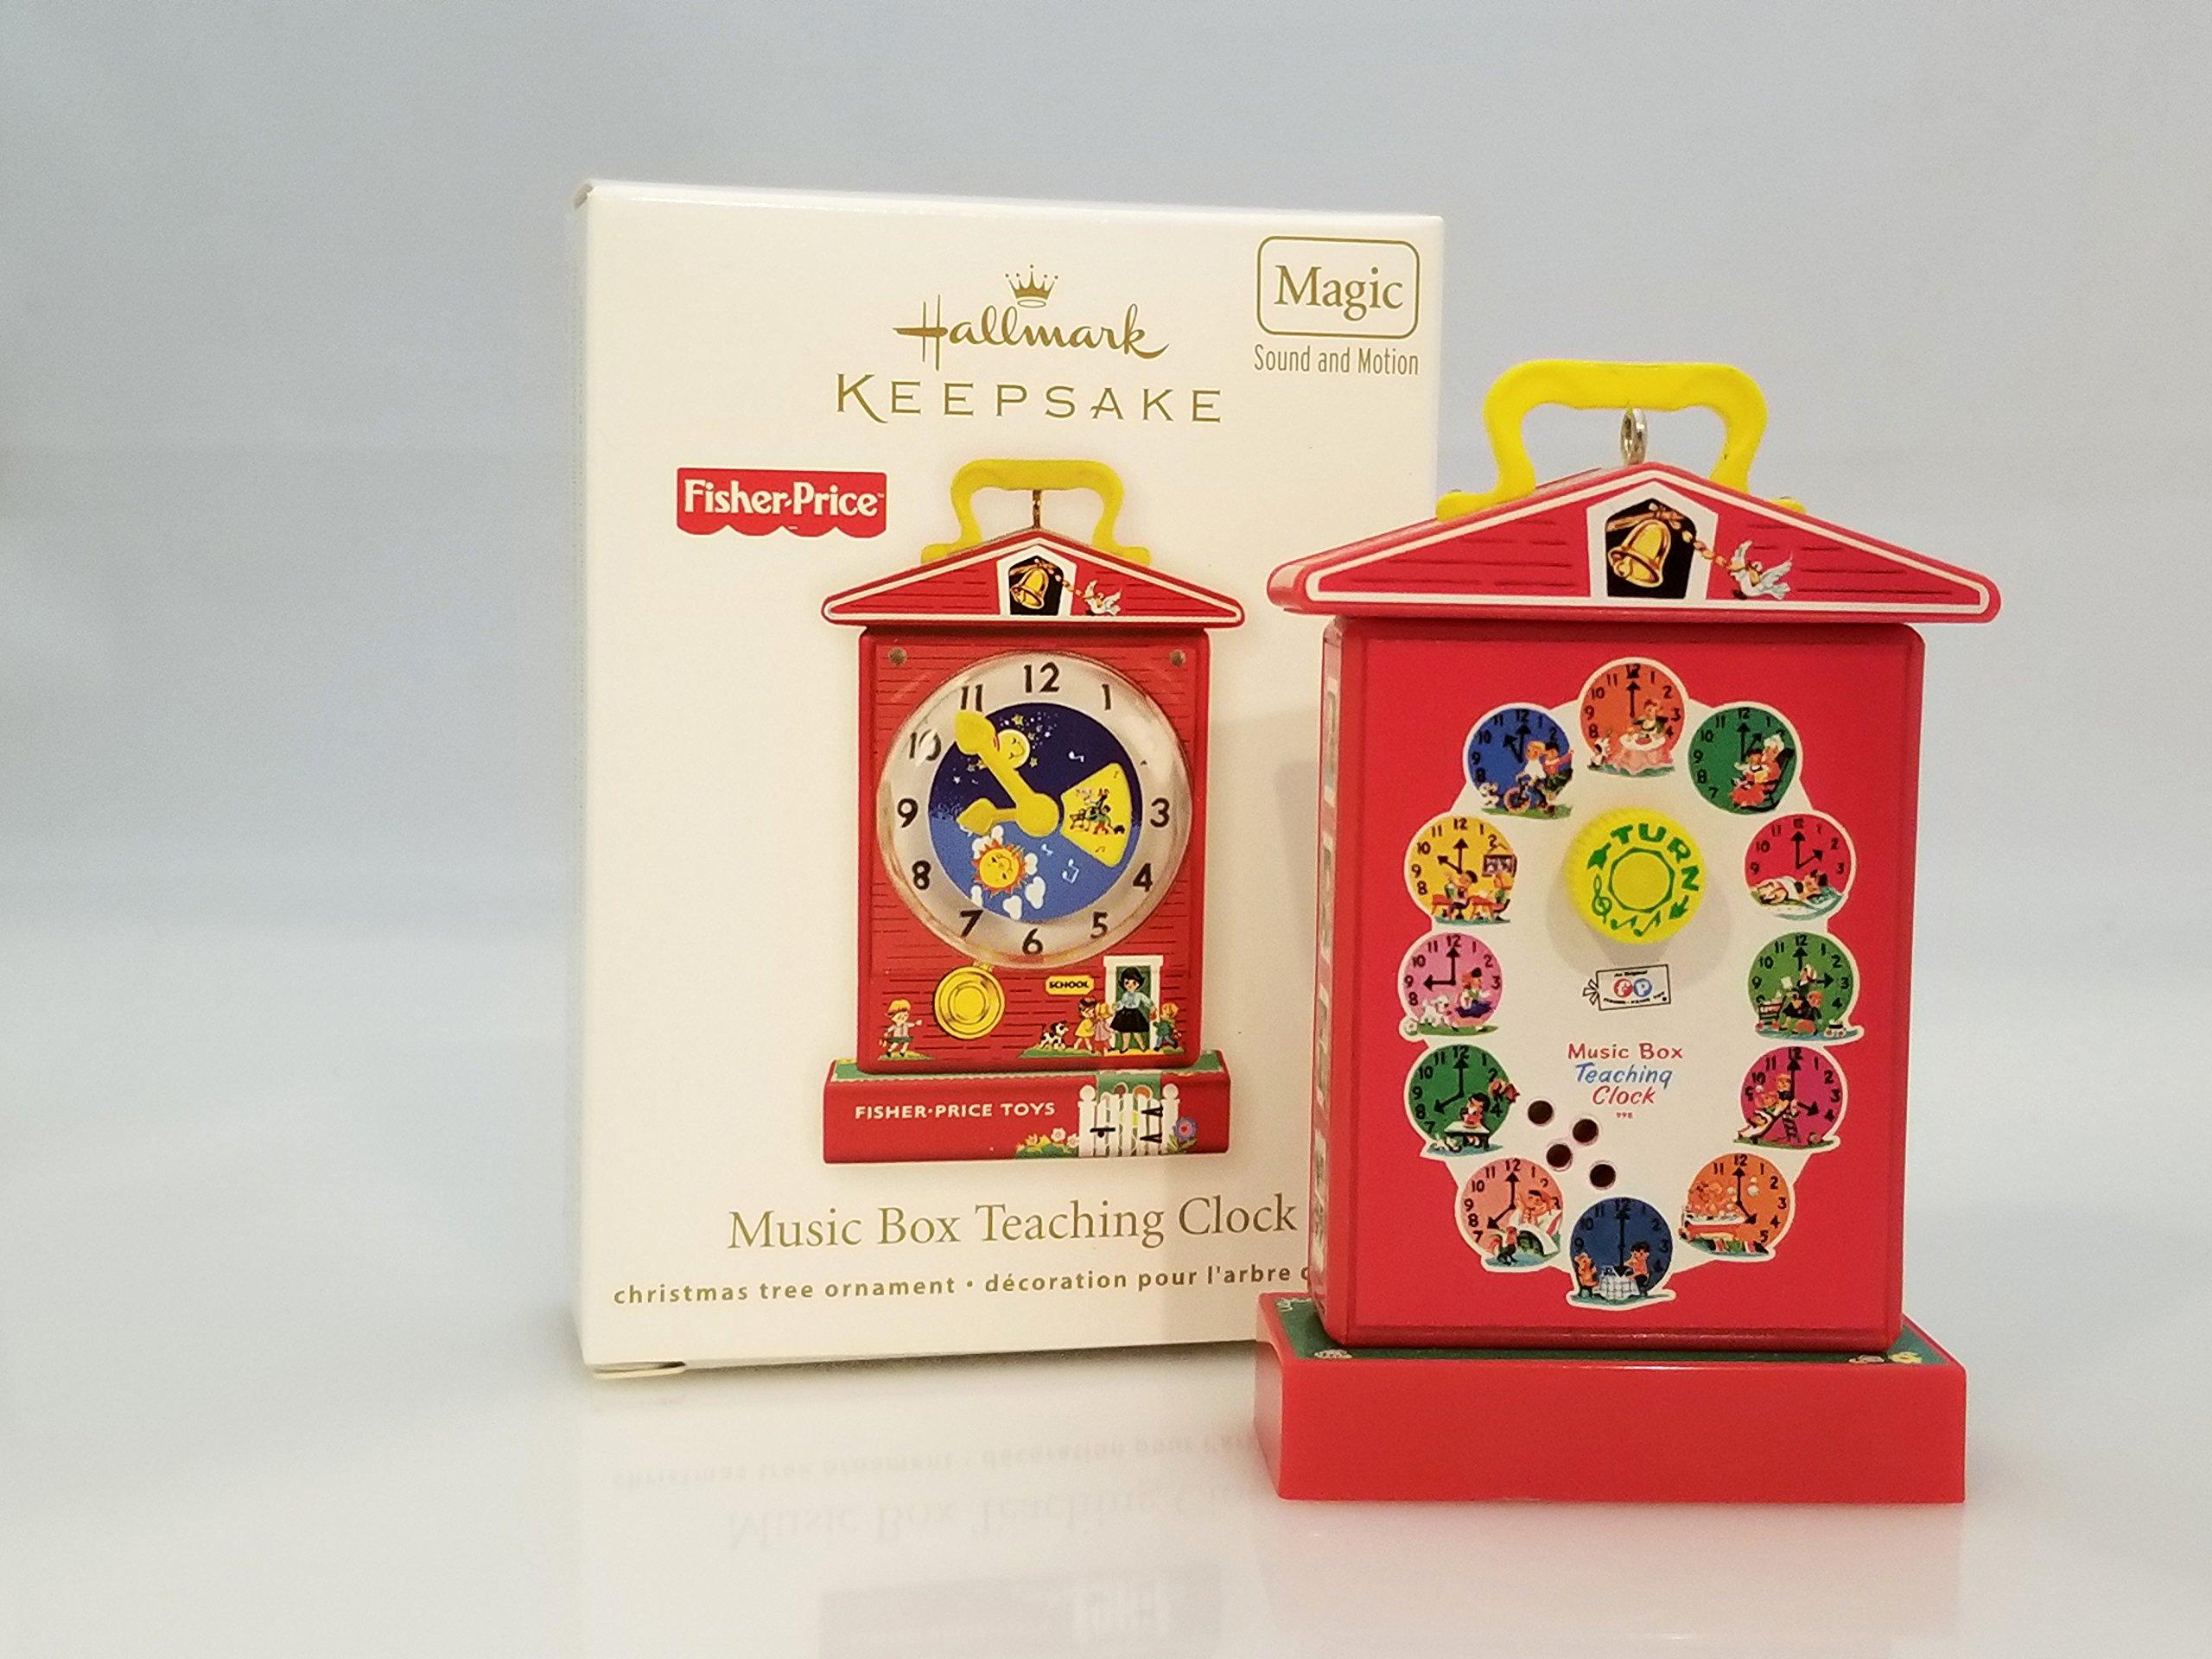 Hallmark Magic Ornament 2011 Music Box Teaching Clock - Fisher Price - #QXI2459